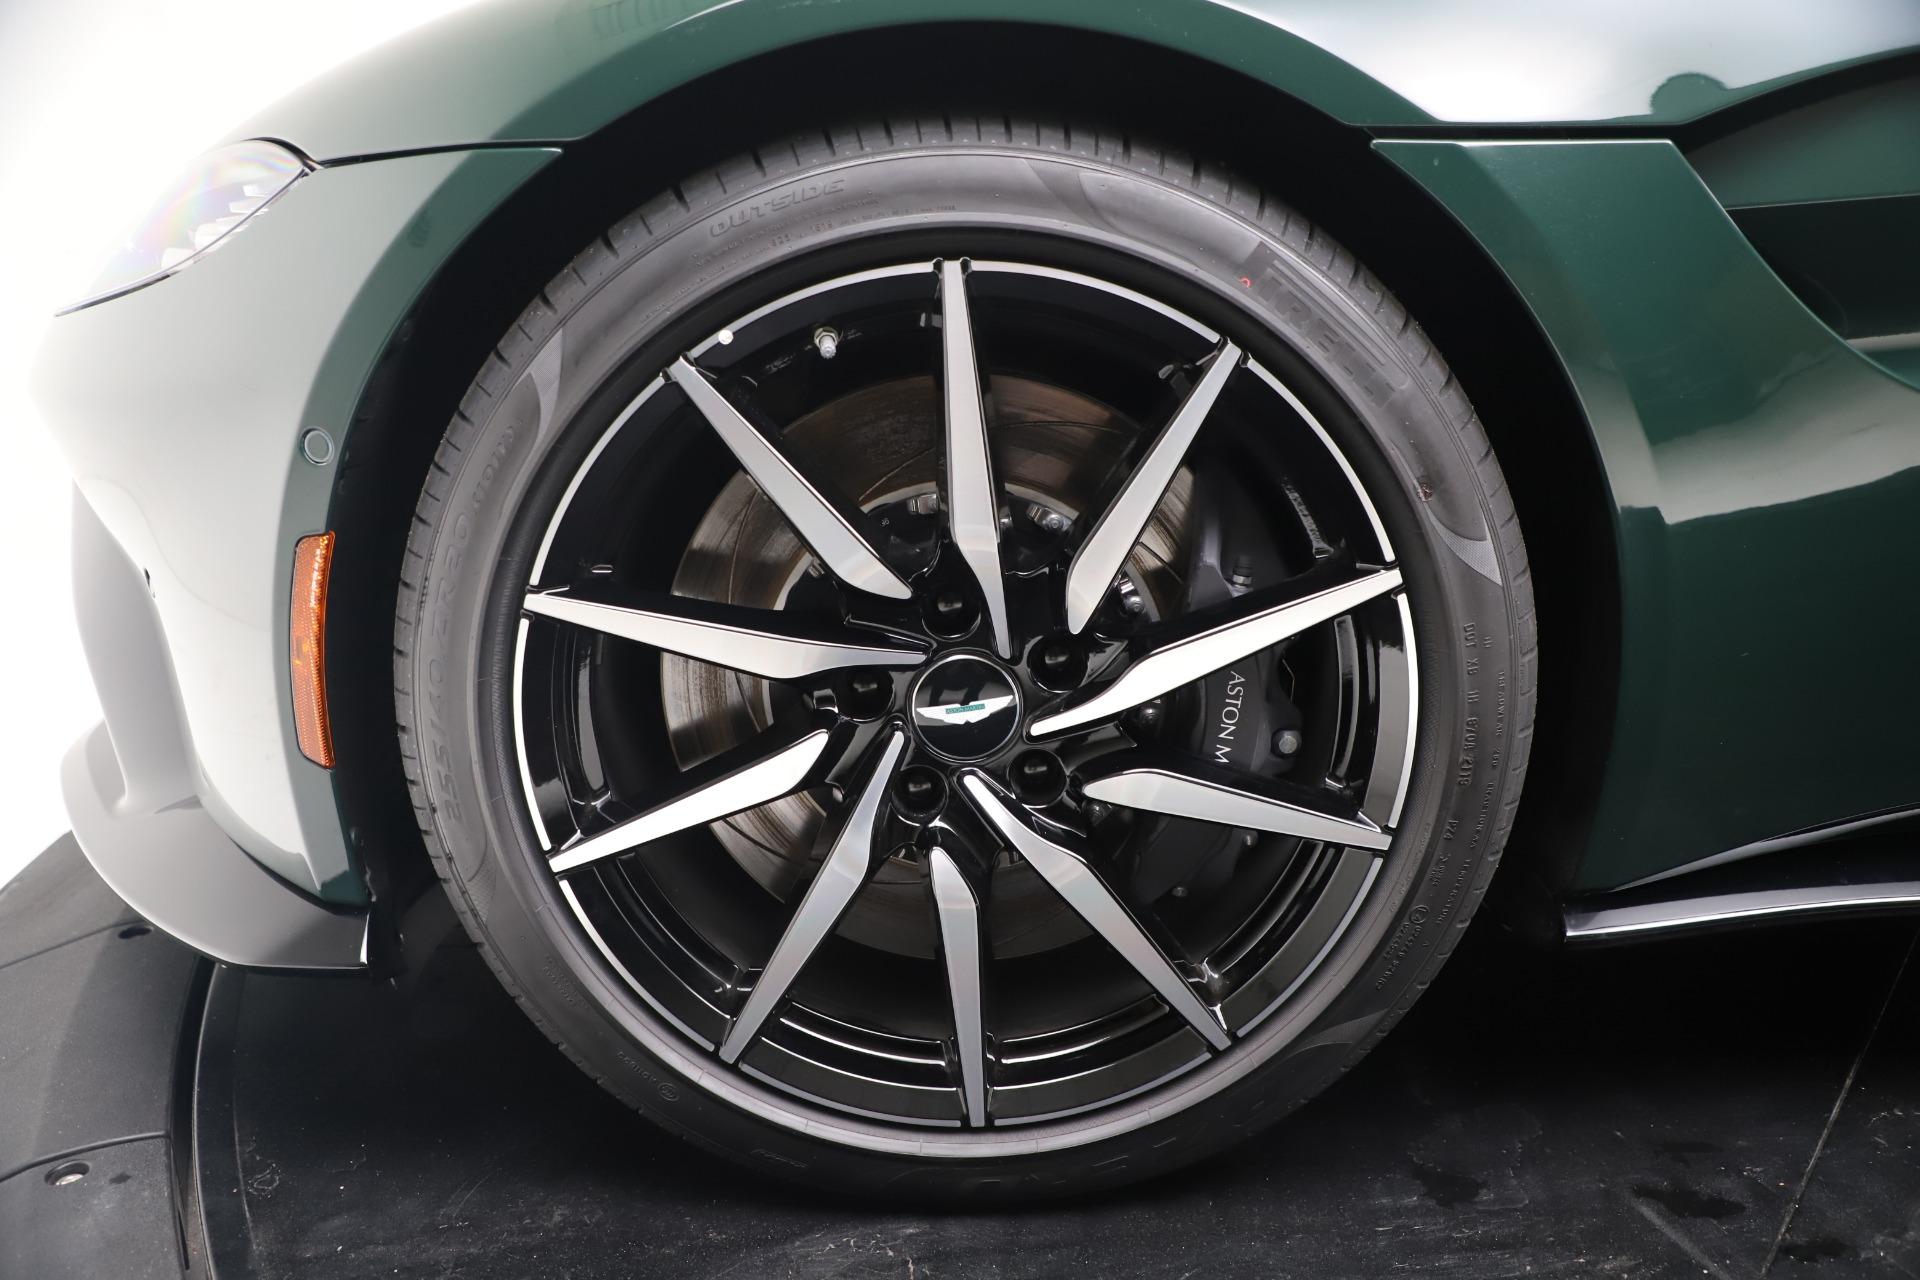 New 2020 Aston Martin Vantage V8 For Sale In Greenwich, CT 3483_p18